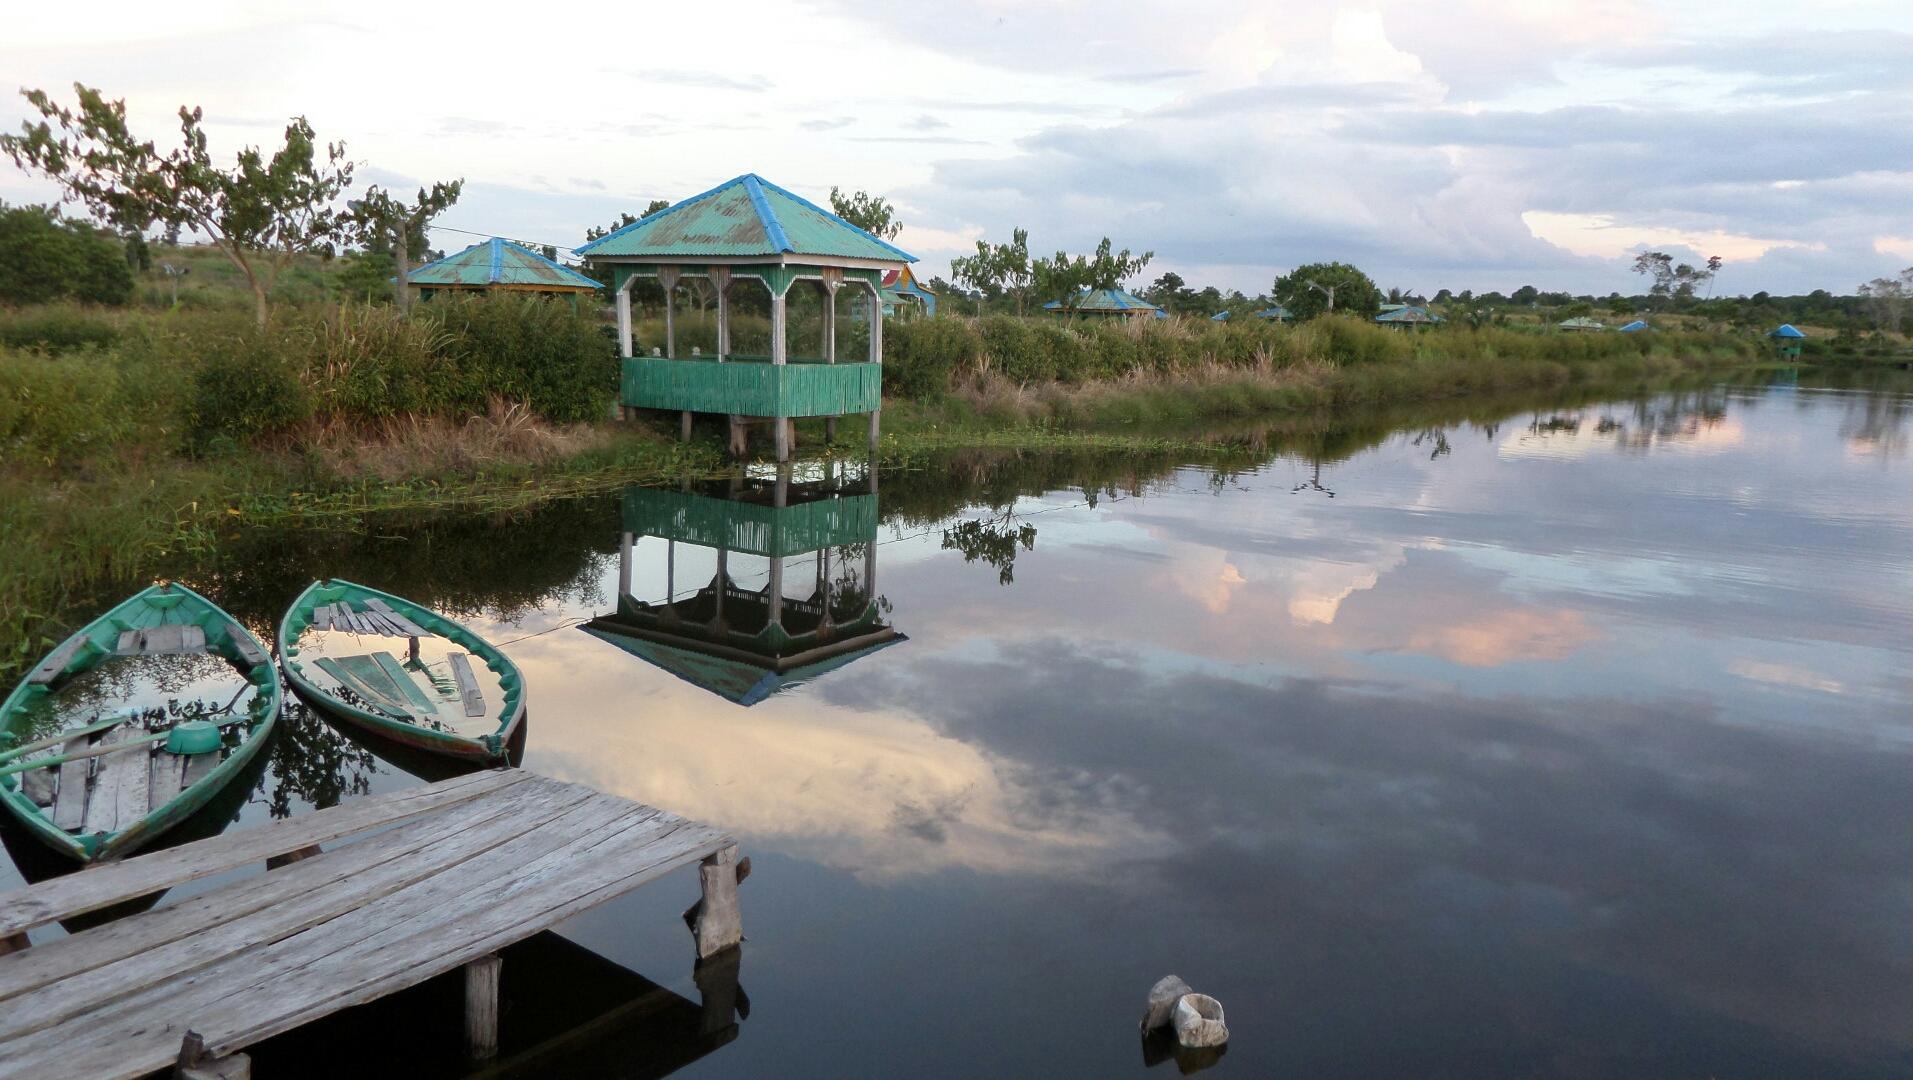 Lubuk Hijau Tempat Wisata Keluarga Bagi Masyarakat